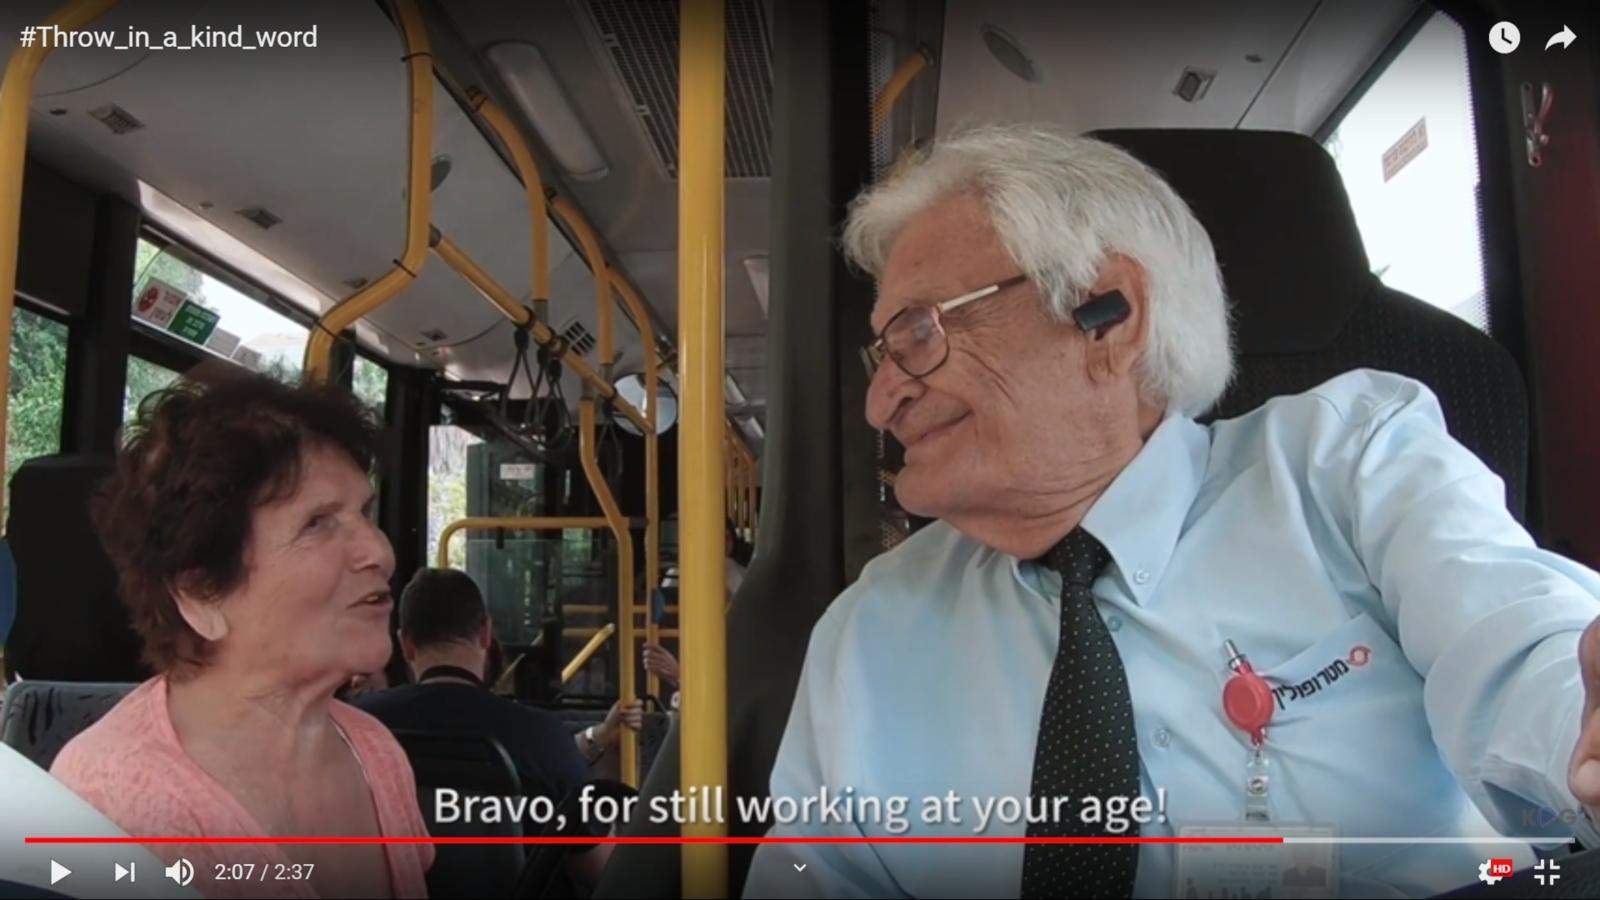 Heartwarming Israeli bus and beer videos win Webby Awards